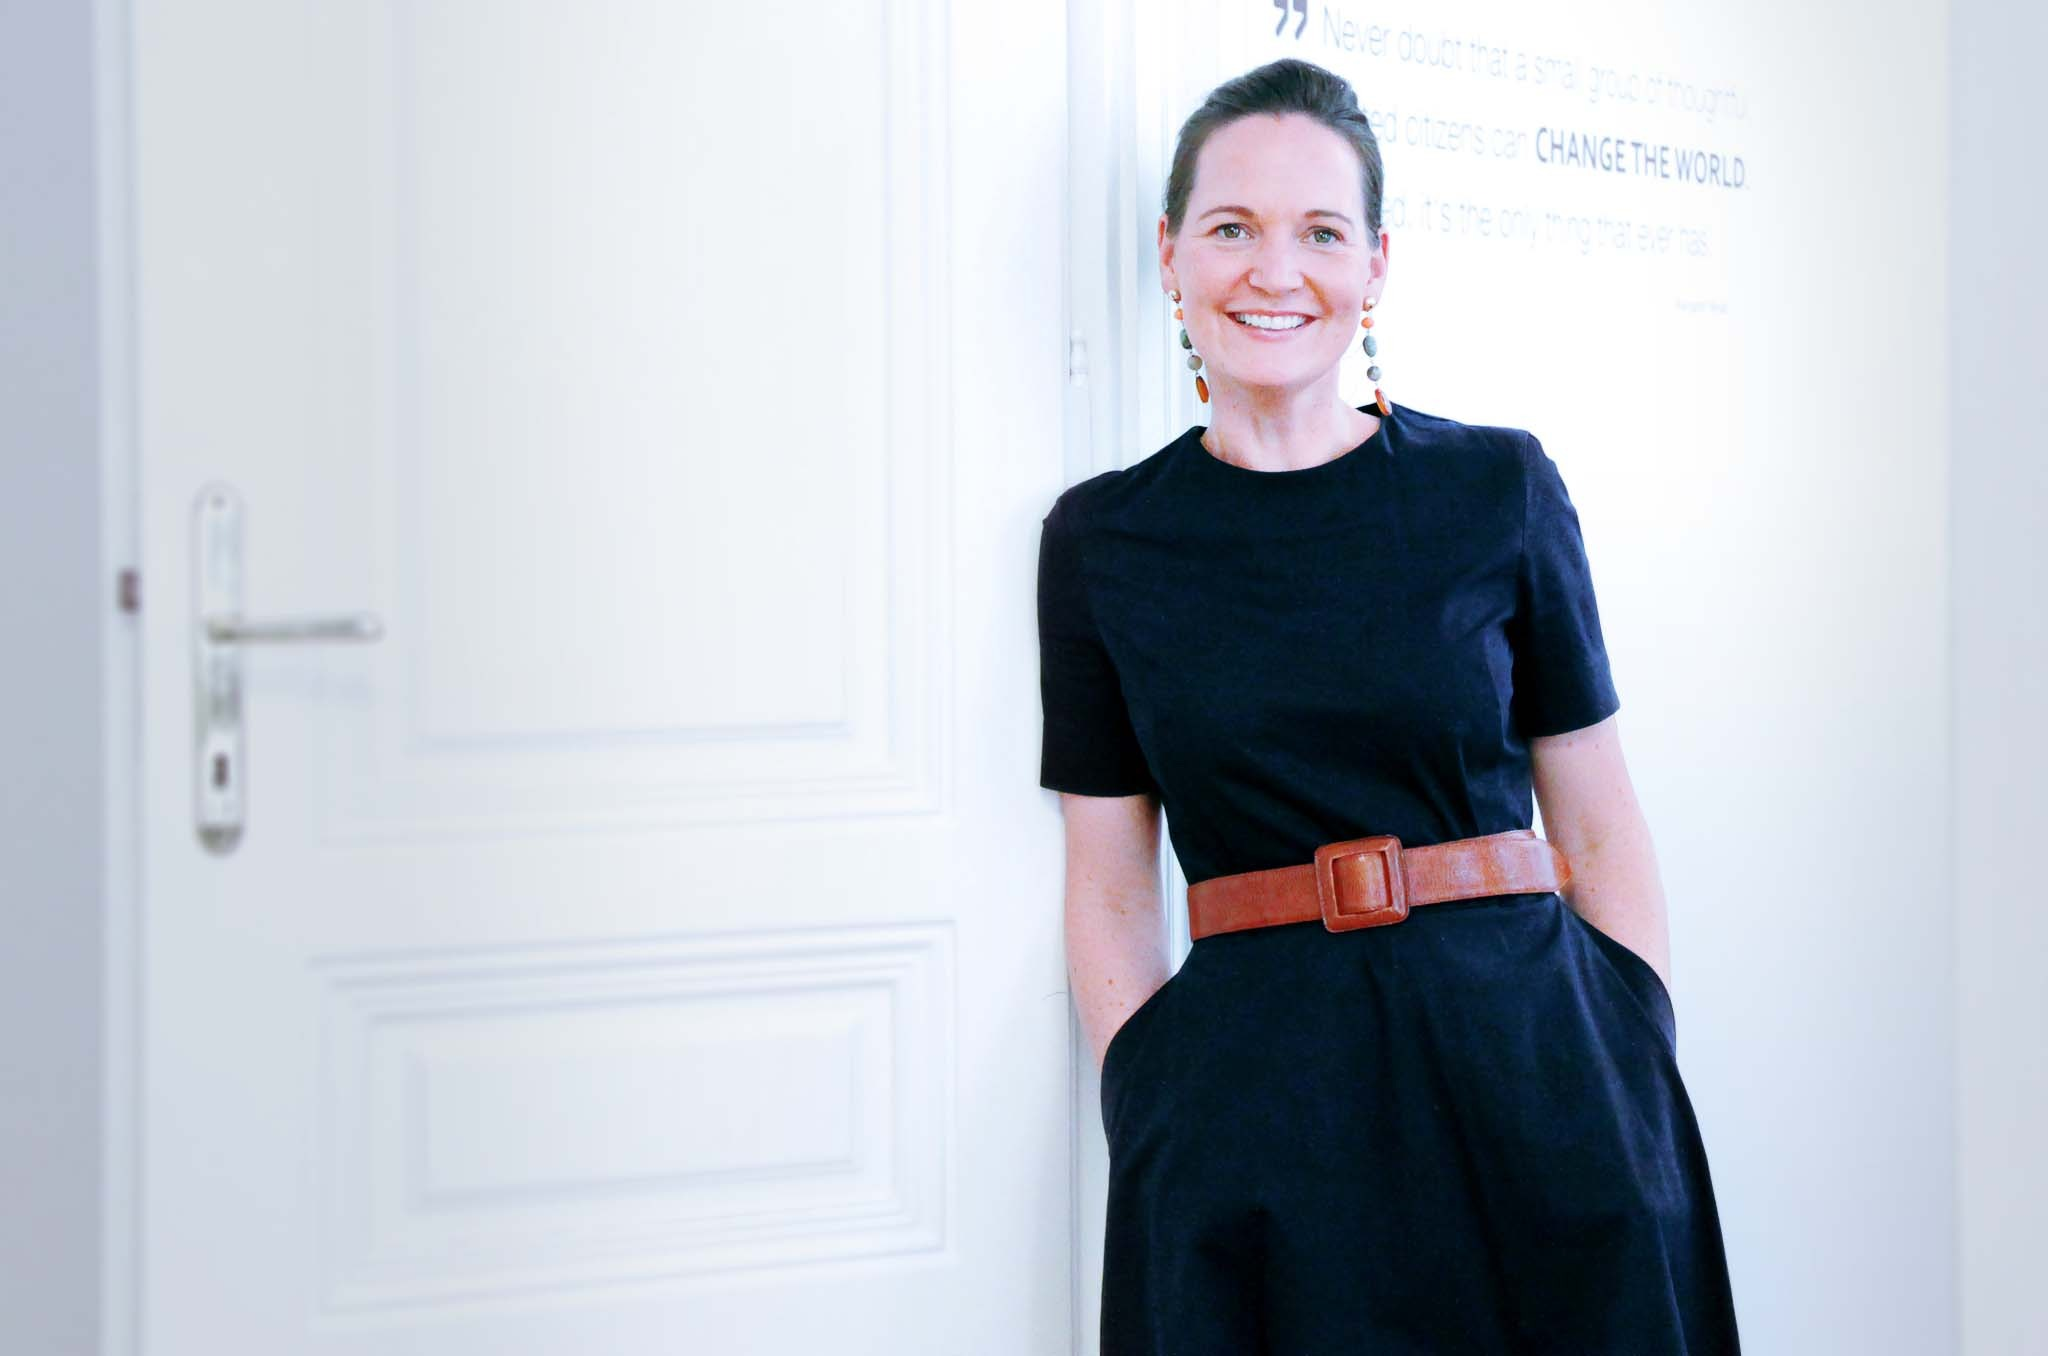 Victoria Grothe Expertin Mitarbeiterbefragung Emplyee Experience